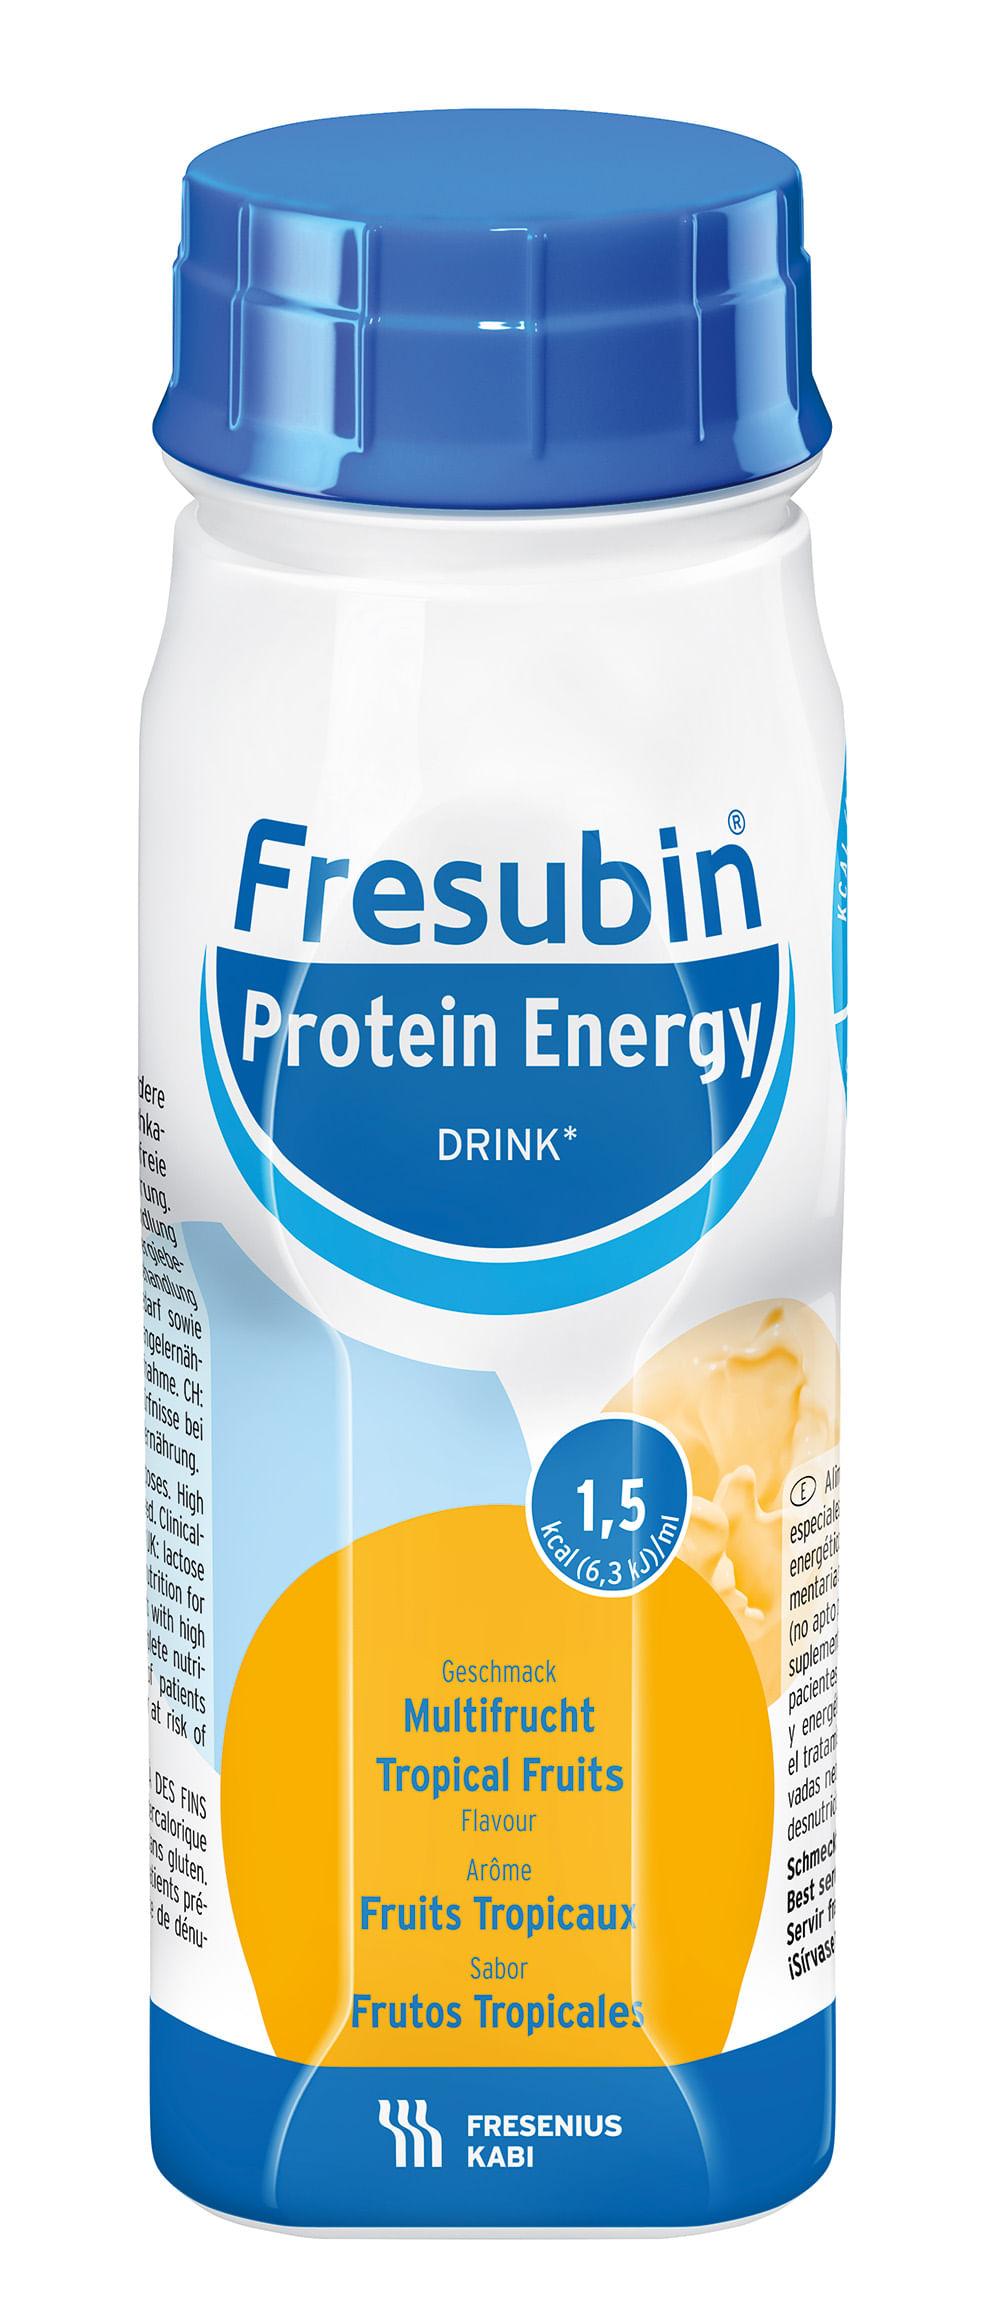 Fresubin_Protein_Energy_Tropical-Fruits_EBo_Frontal